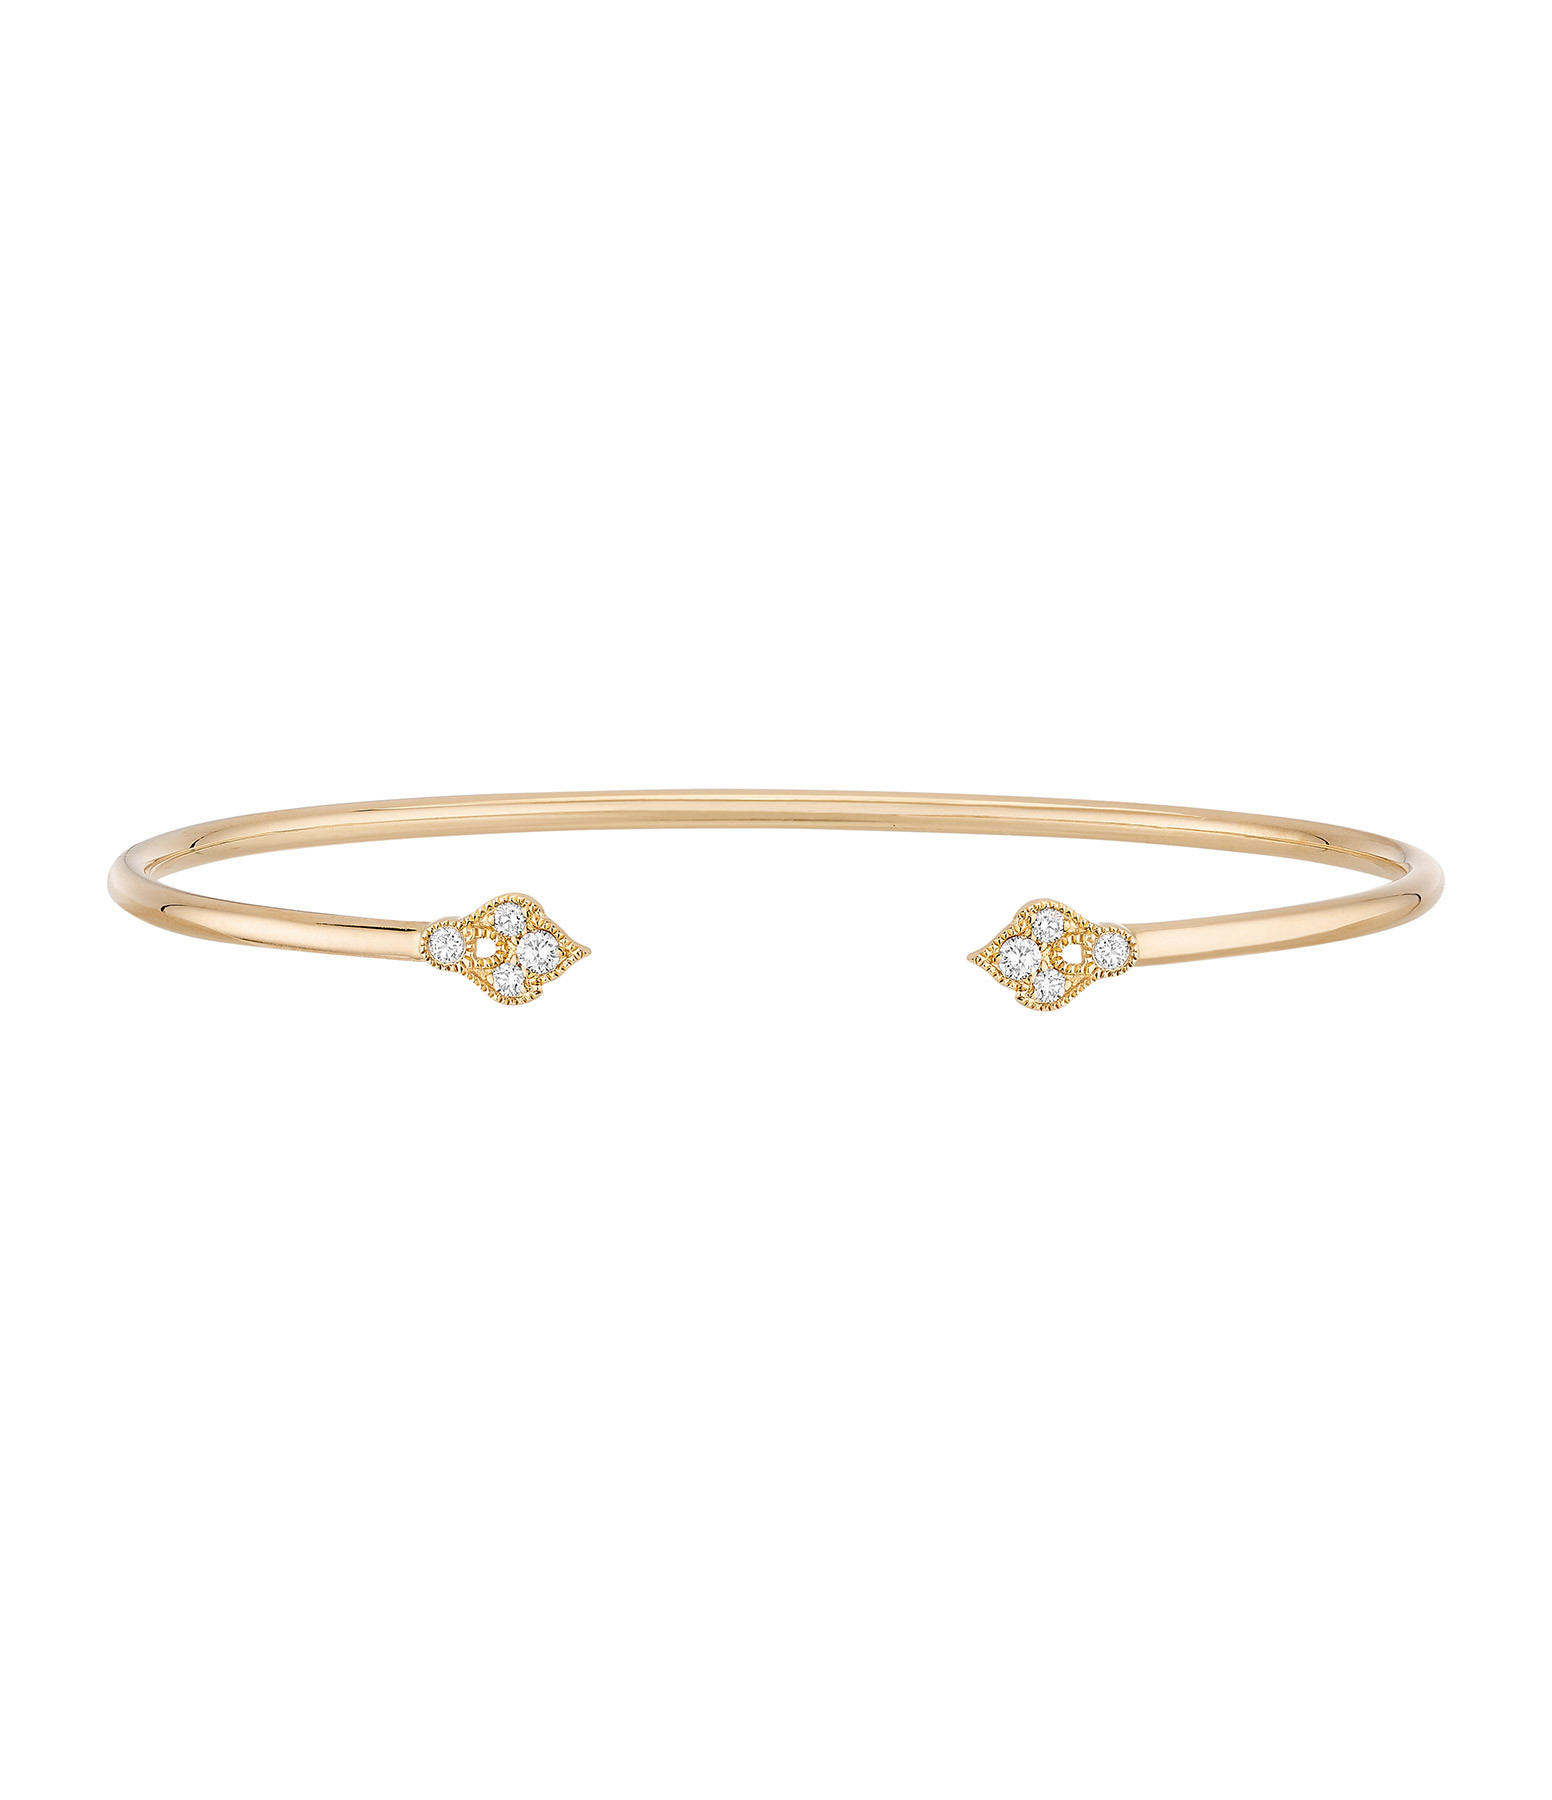 STONE PARIS - Jonc Flexible Sultane Or Diamants